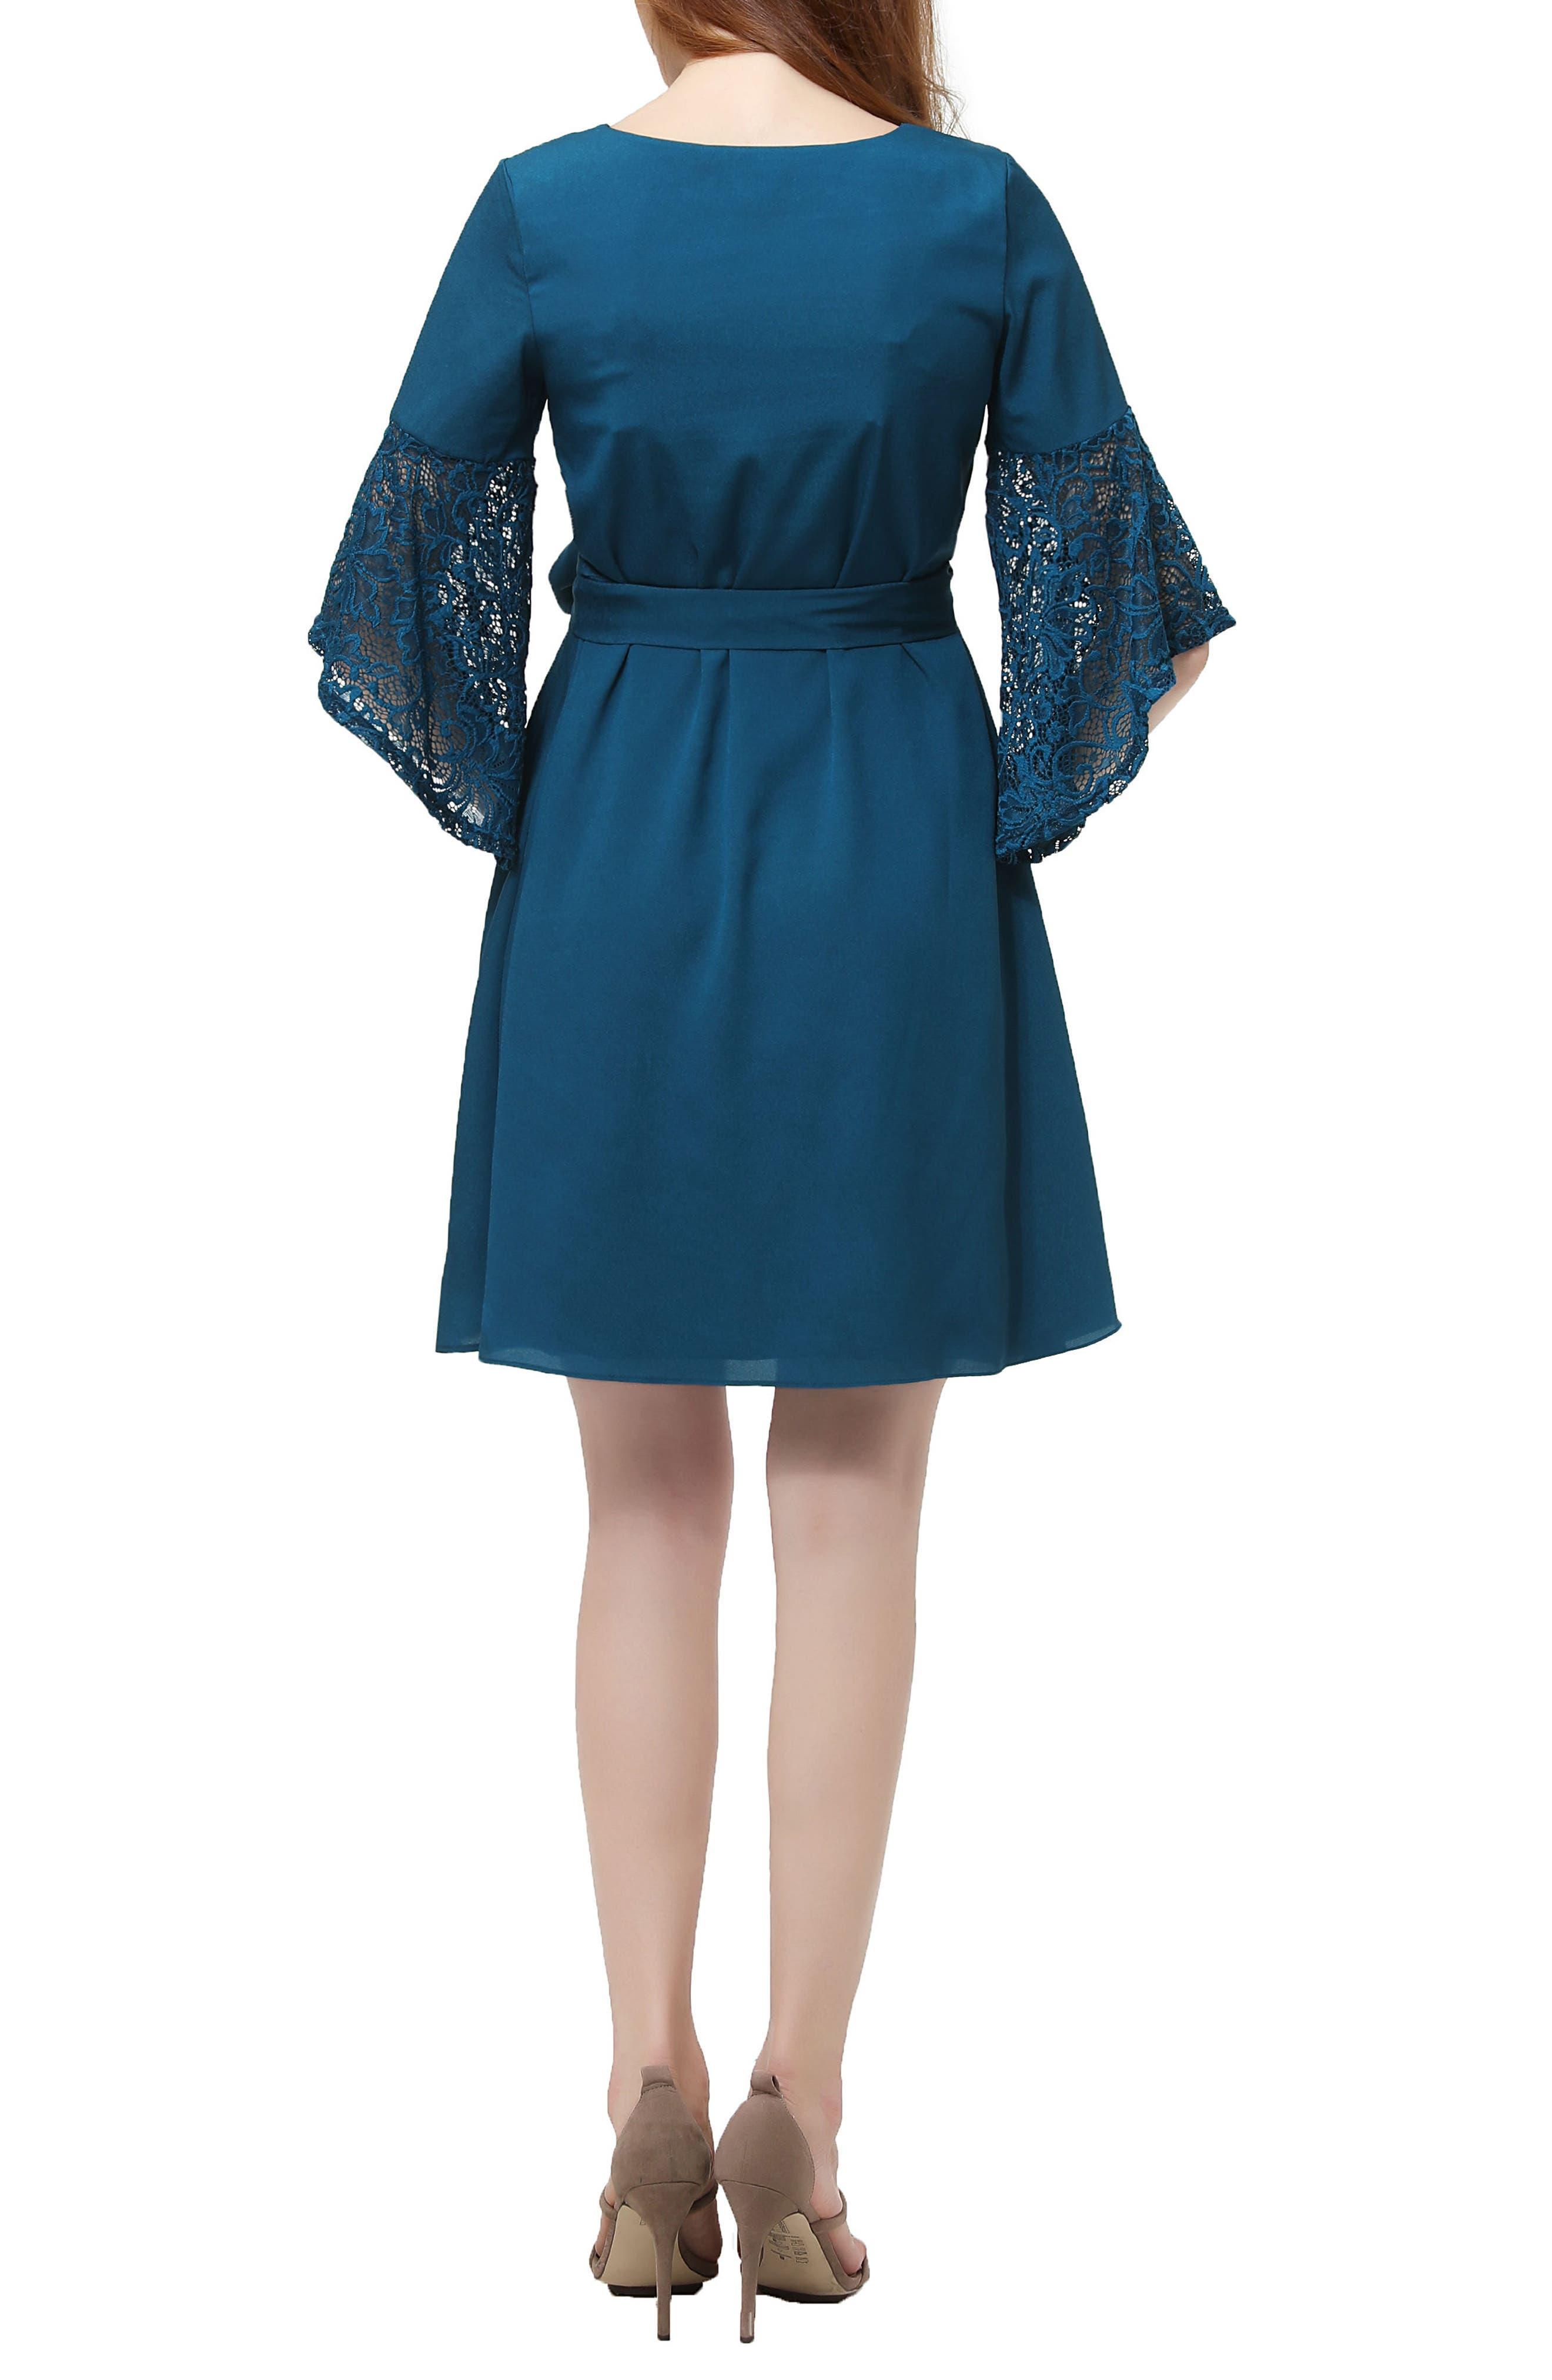 Abbey Lace Trim Maternity Dress,                             Alternate thumbnail 2, color,                             DEEP SEA